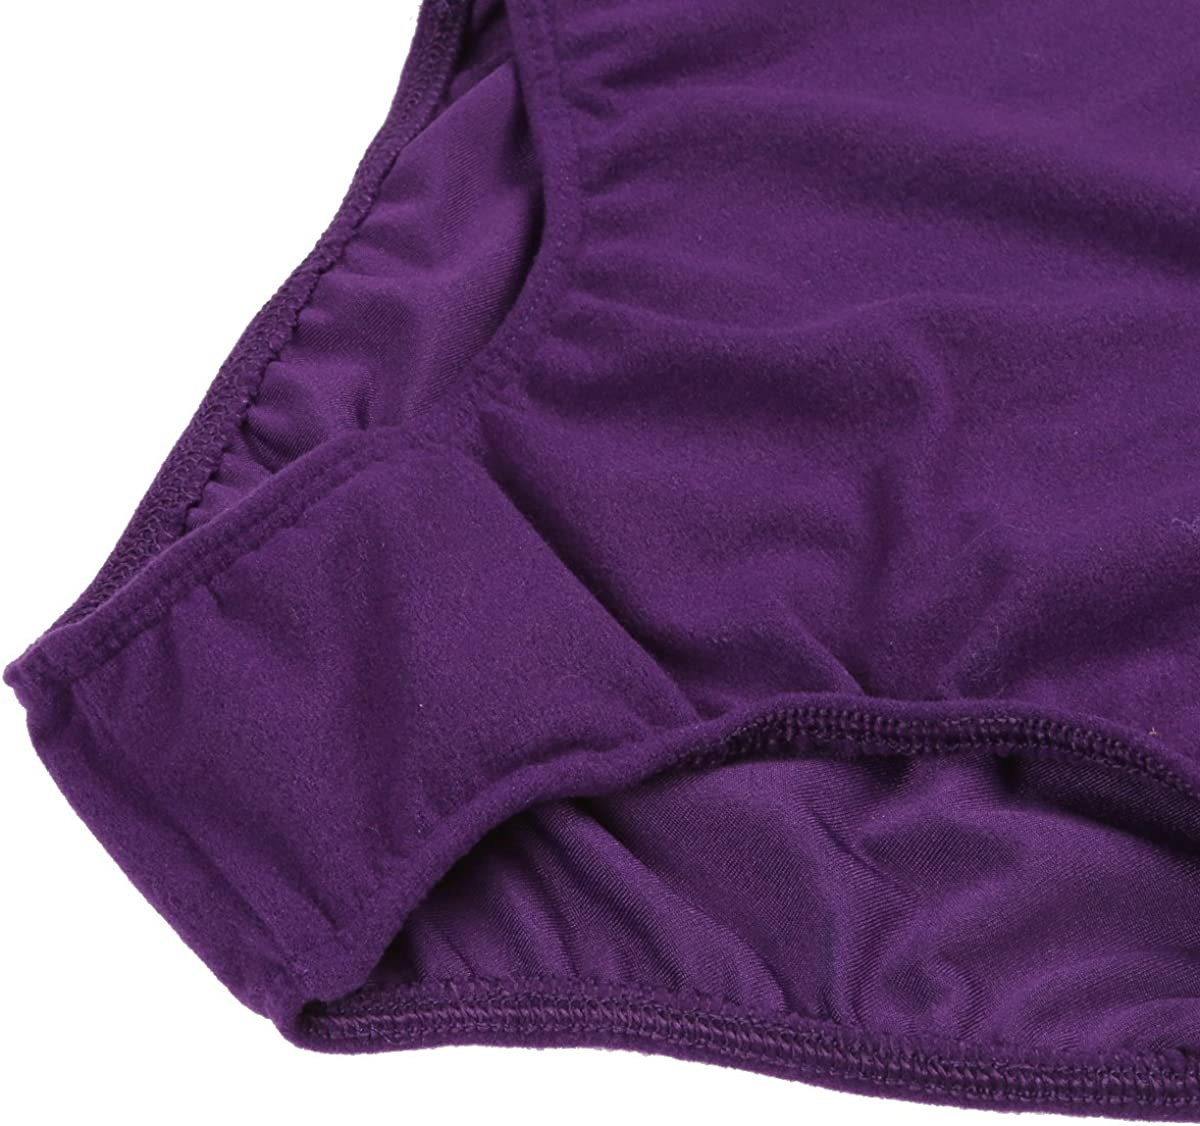 iixpin Kids Girls One Piece Basic Ballet Dance Leotard Short Sleeves Cotton Gymnastic Dancewear Classic Unitard